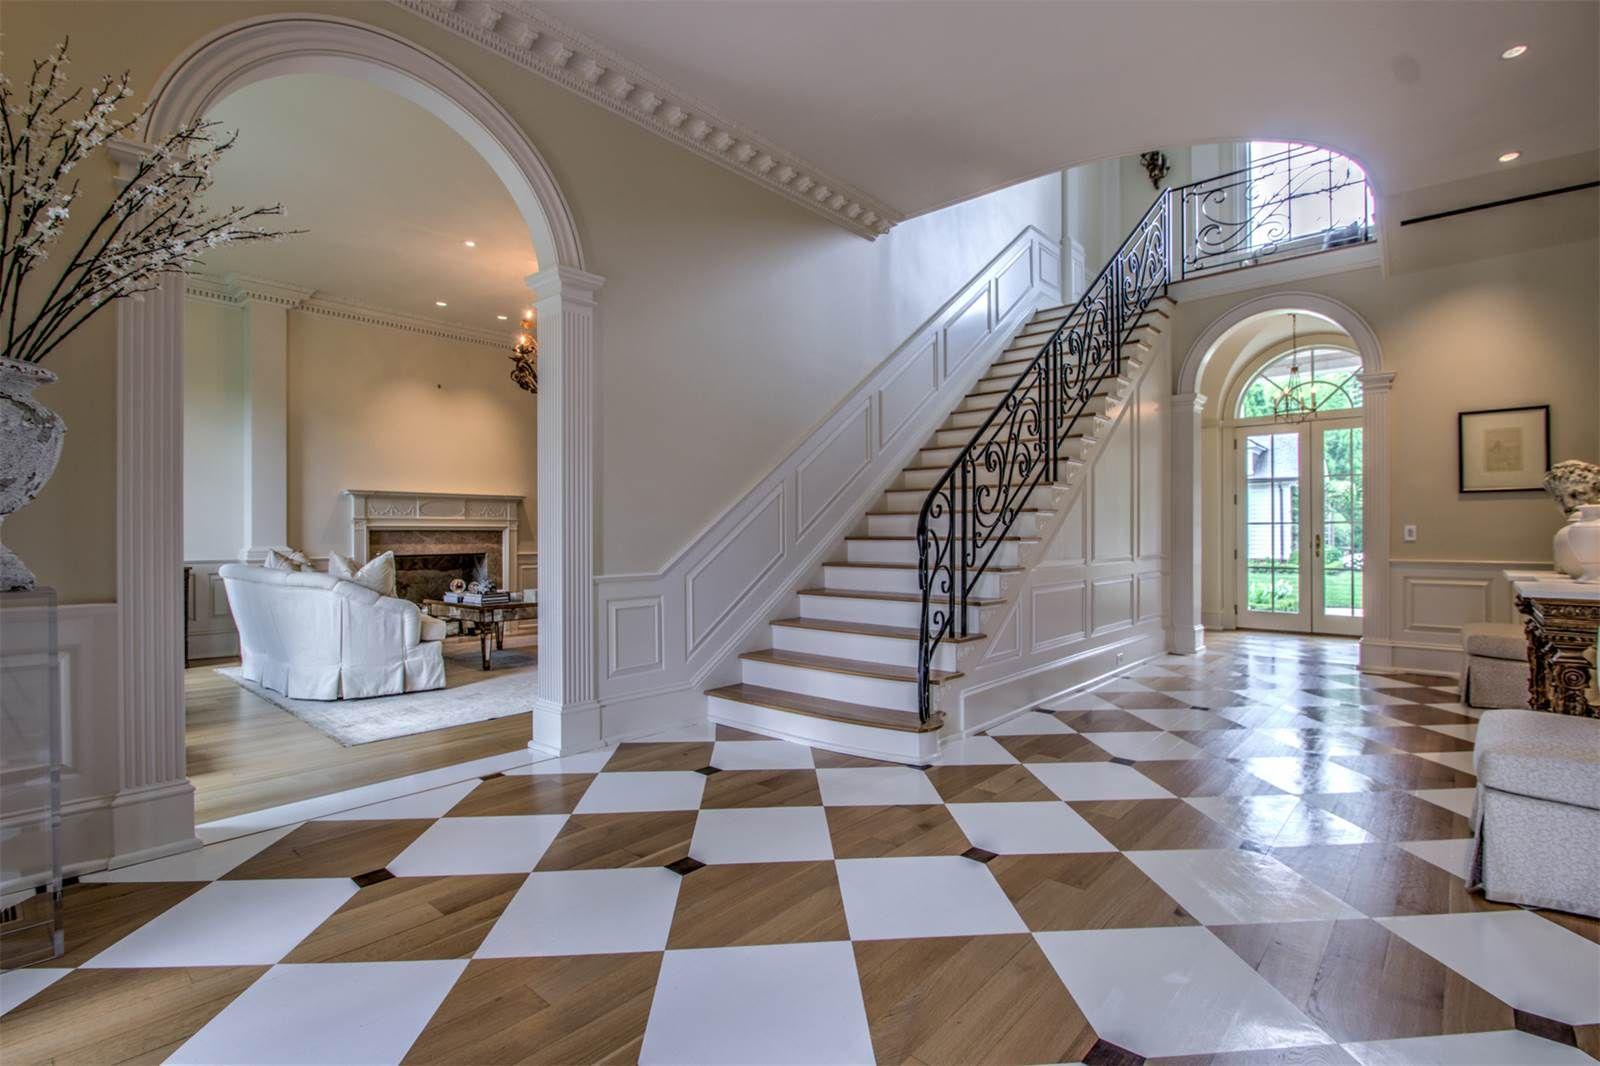 2750 Habersham Road, Atlanta, Georgia, 30305 - 5585292 - Luxury Real Estate in Dekalb County, Fulton County, Cobb County represented by Atlanta Fine Homes Sotheby's International Realty